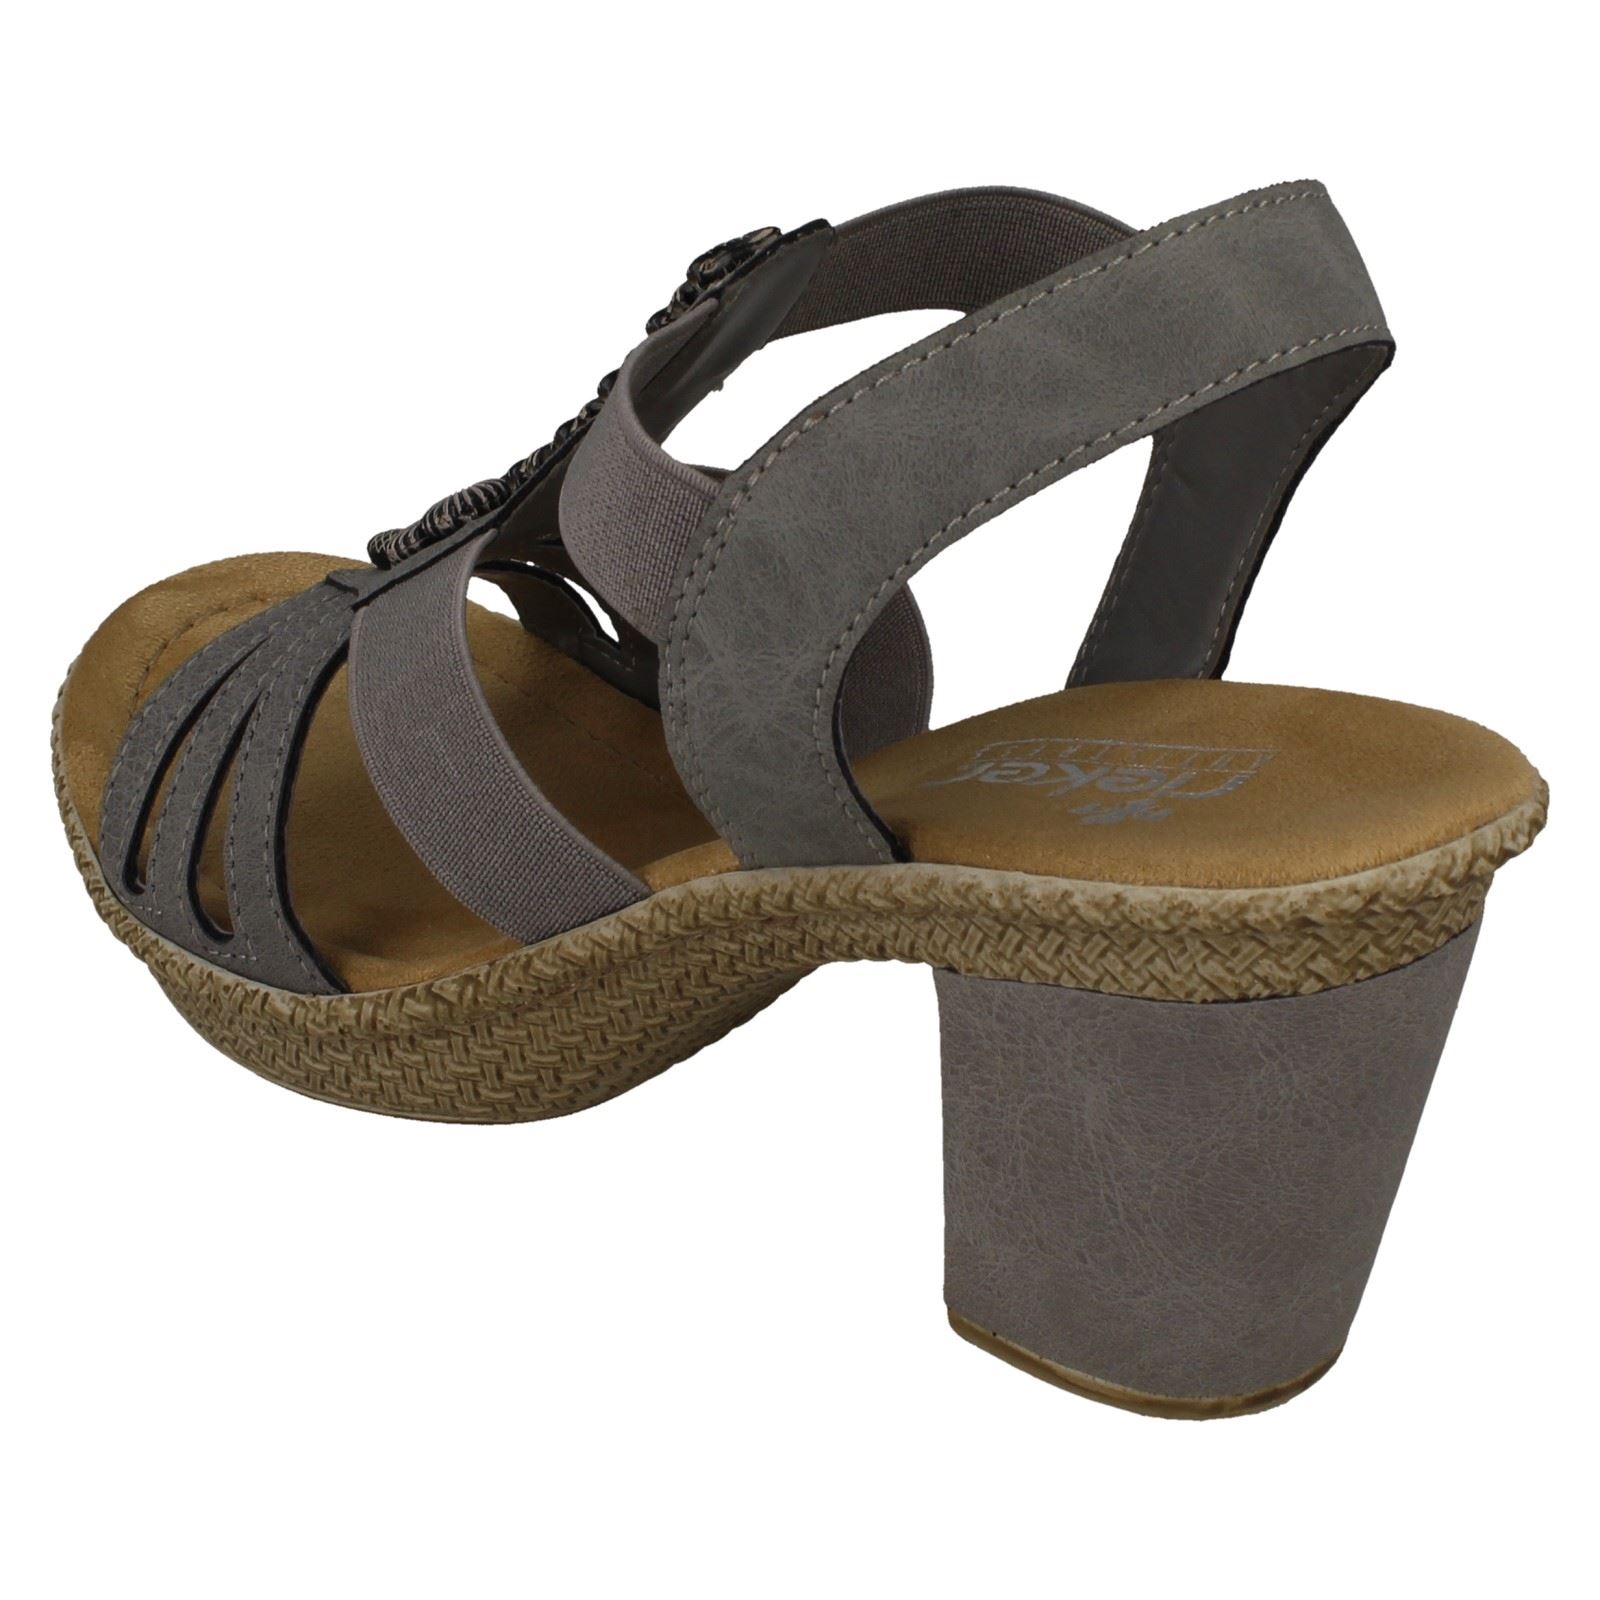 Rieker Sandales à talons (Vert kaki) | TORFS.BE | Livraison